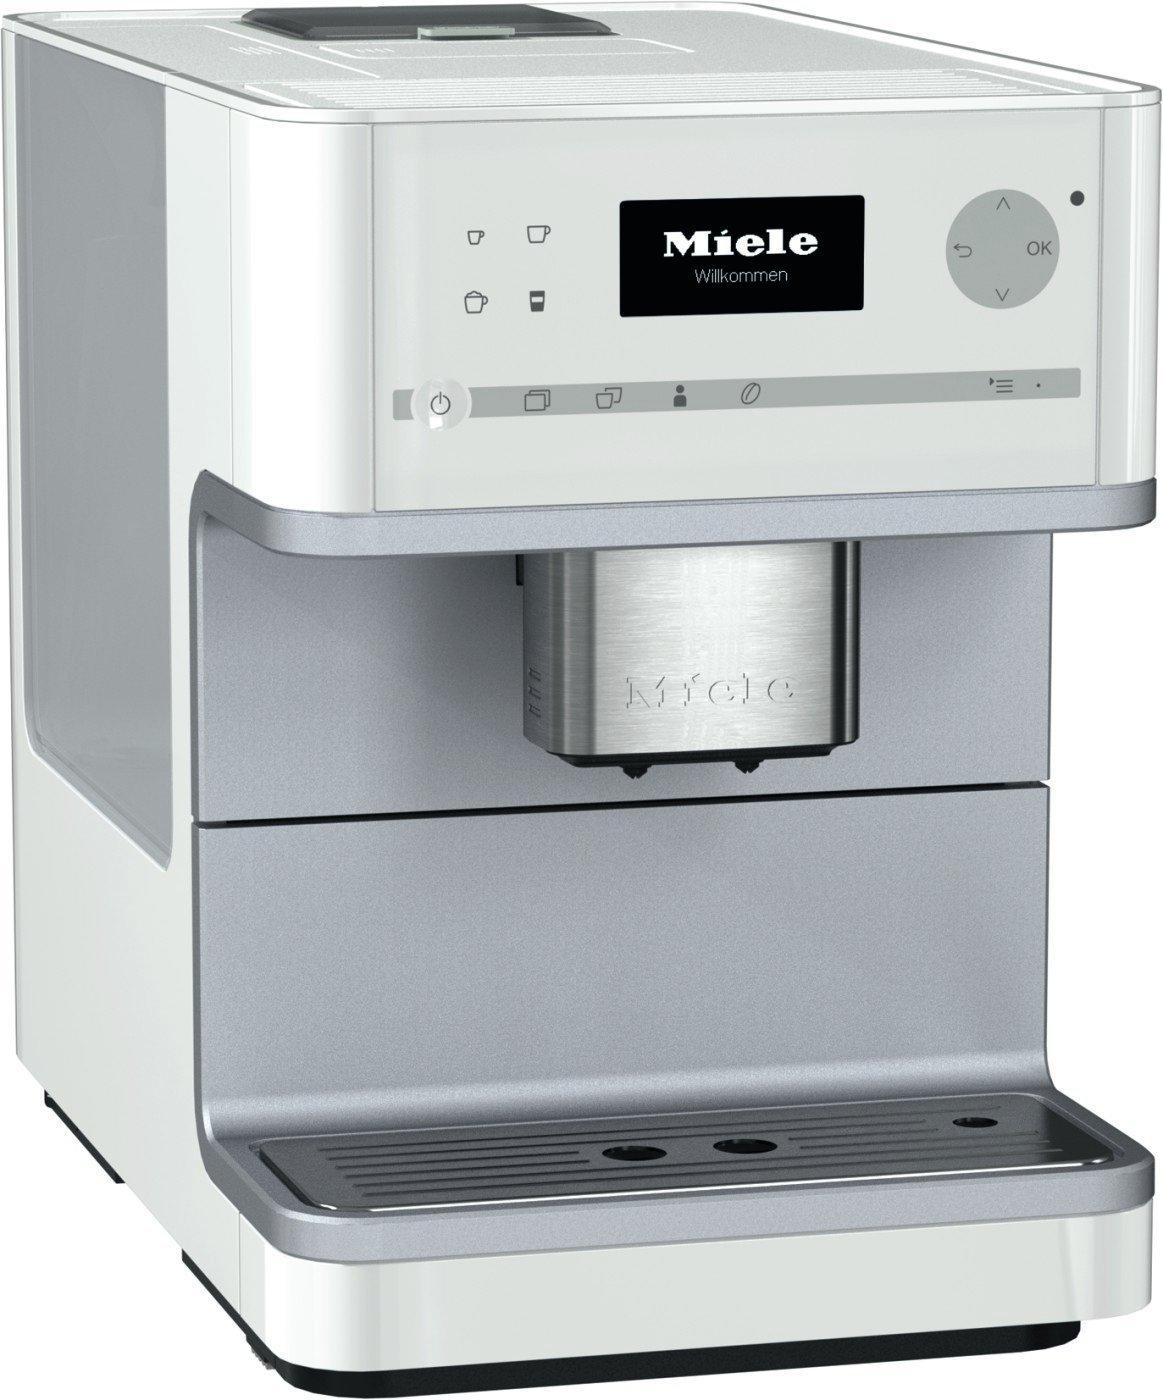 Amazon.com: CM 6110 Coffee System (White): Kitchen & Dining